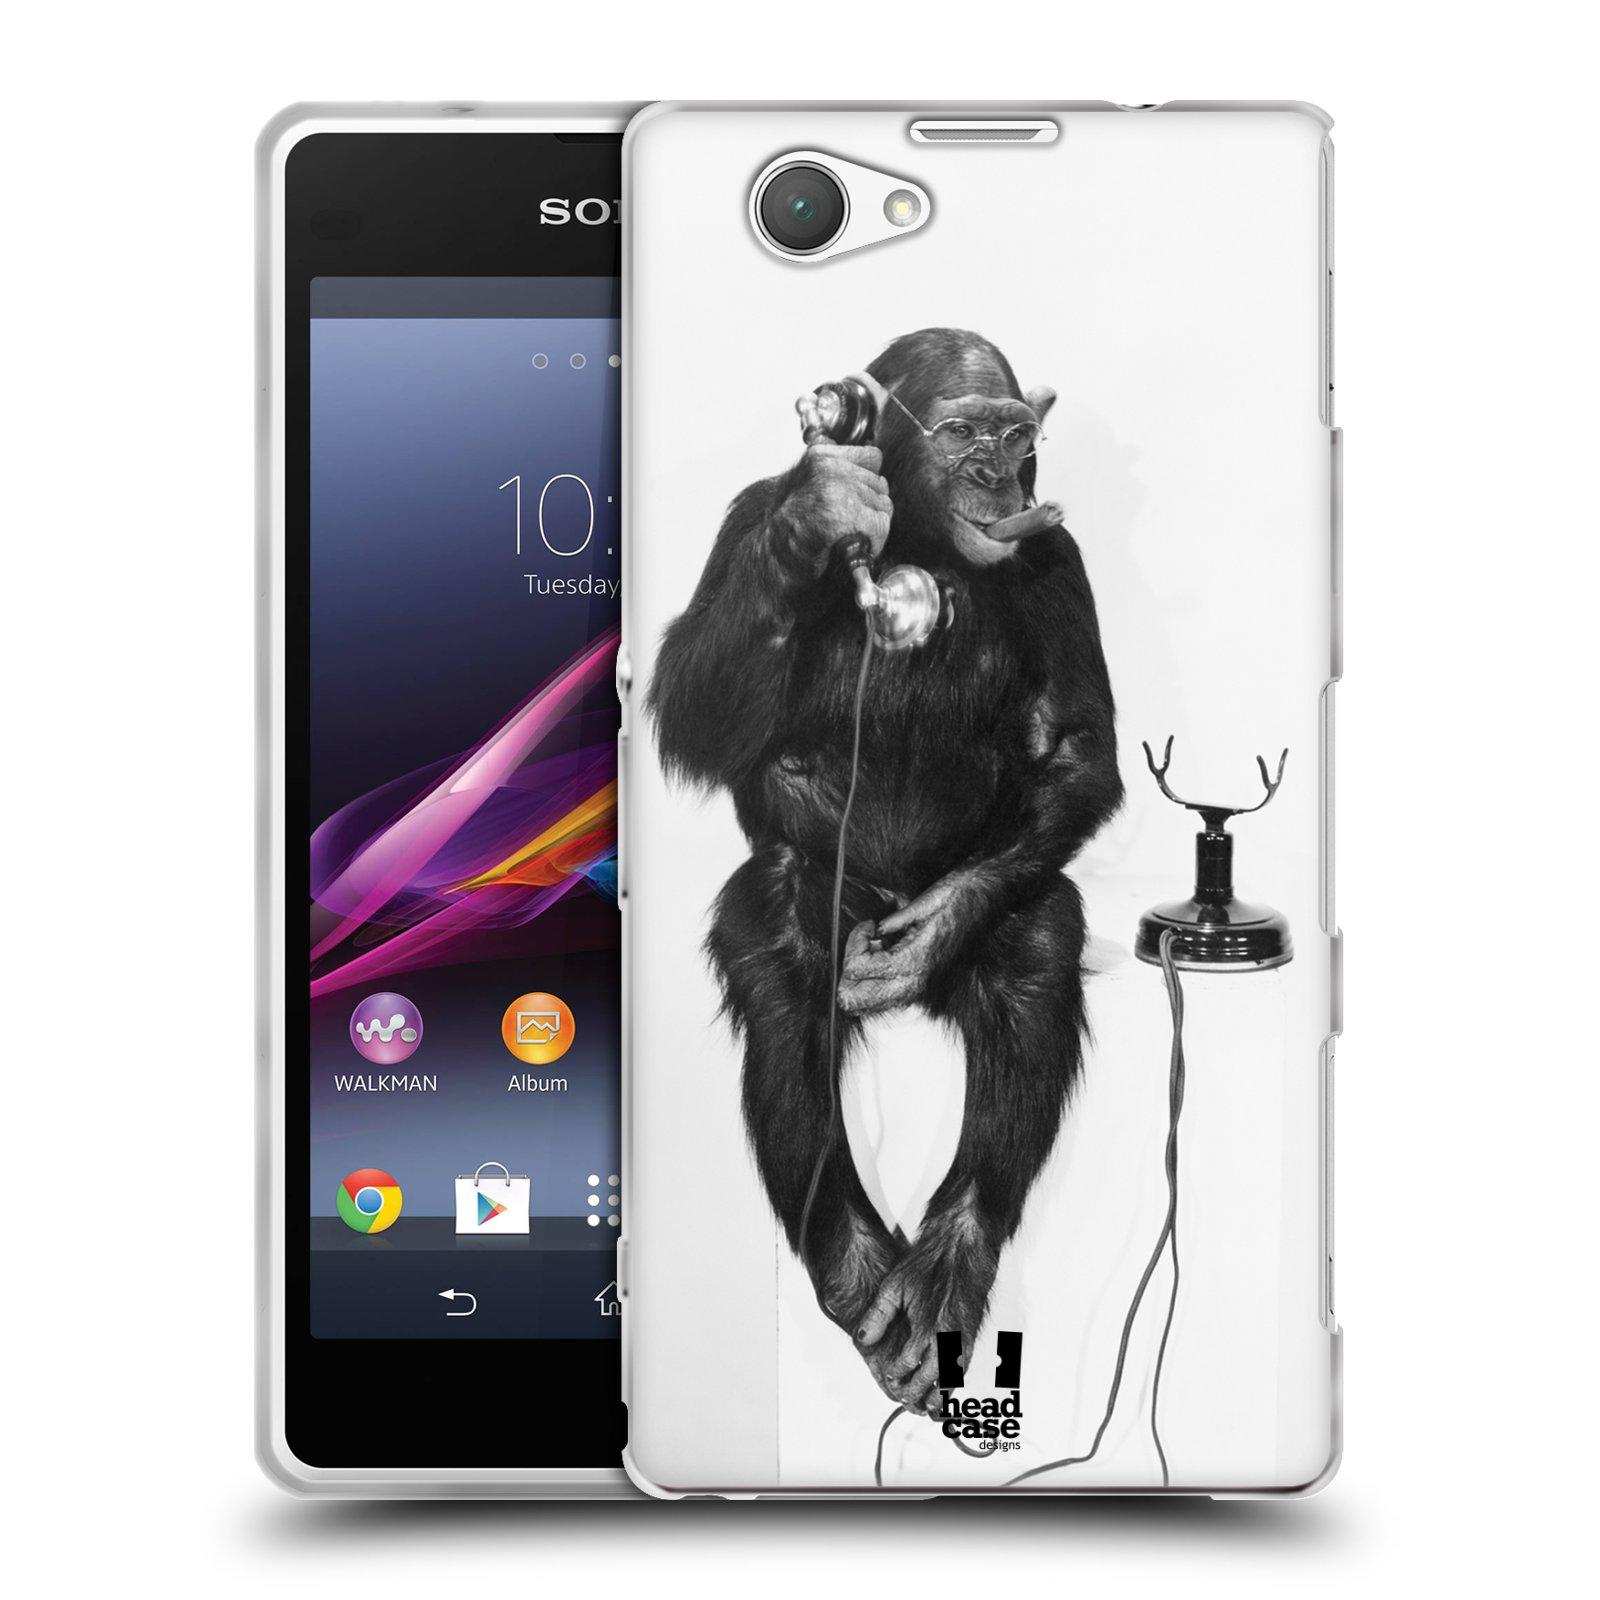 Silikonové pouzdro na mobil Sony Xperia Z1 Compact D5503 HEAD CASE OPIČÁK S TELEFONEM (Silikonový kryt či obal na mobilní telefon Sony Xperia Z1 Compact)